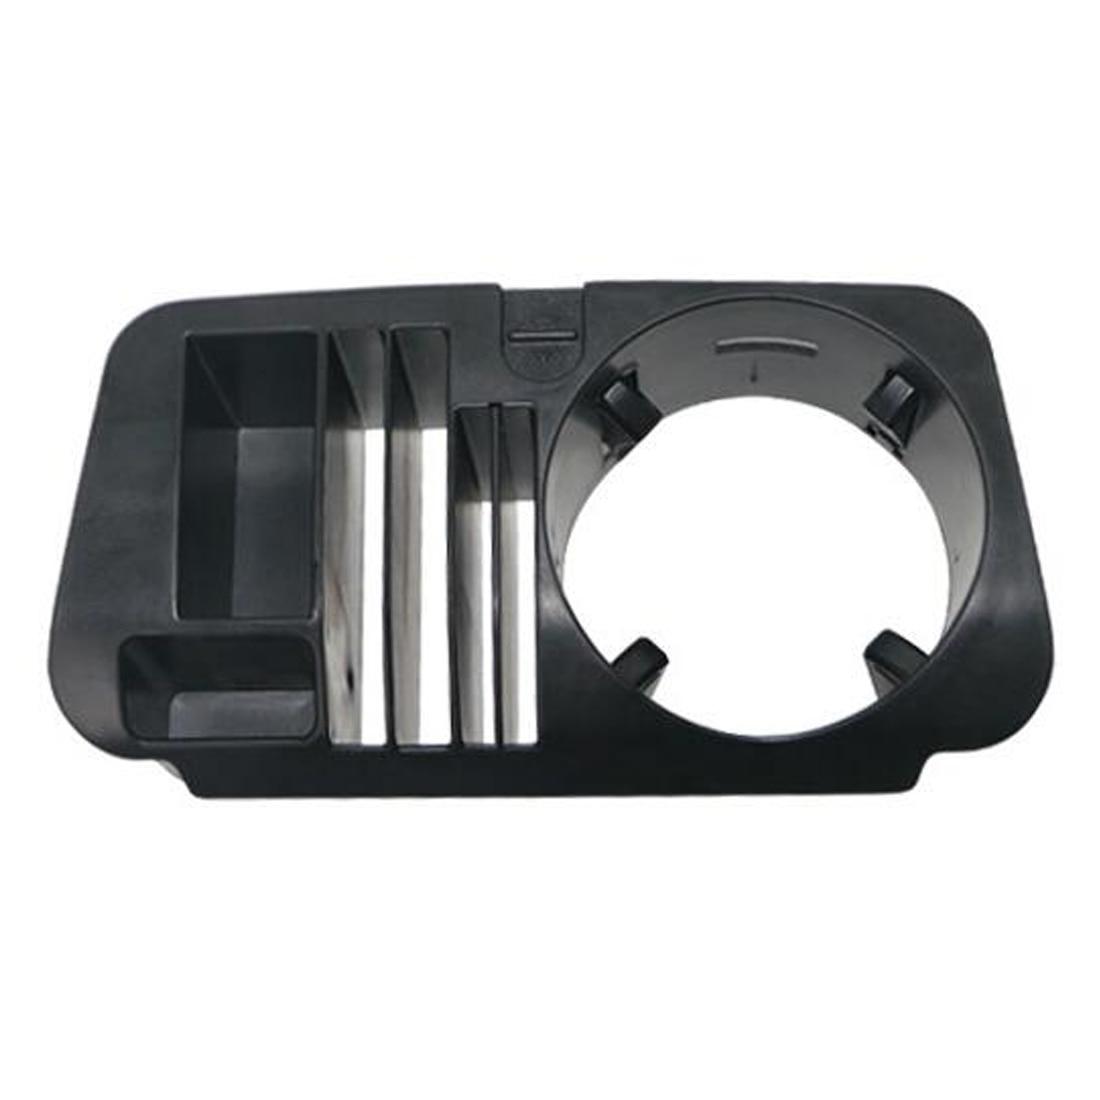 Dewtreetali Car Accessories Car Central Storage Box Cup Holder For Mercedes Benz C class W205/GLC Class X253/E class W213 e200